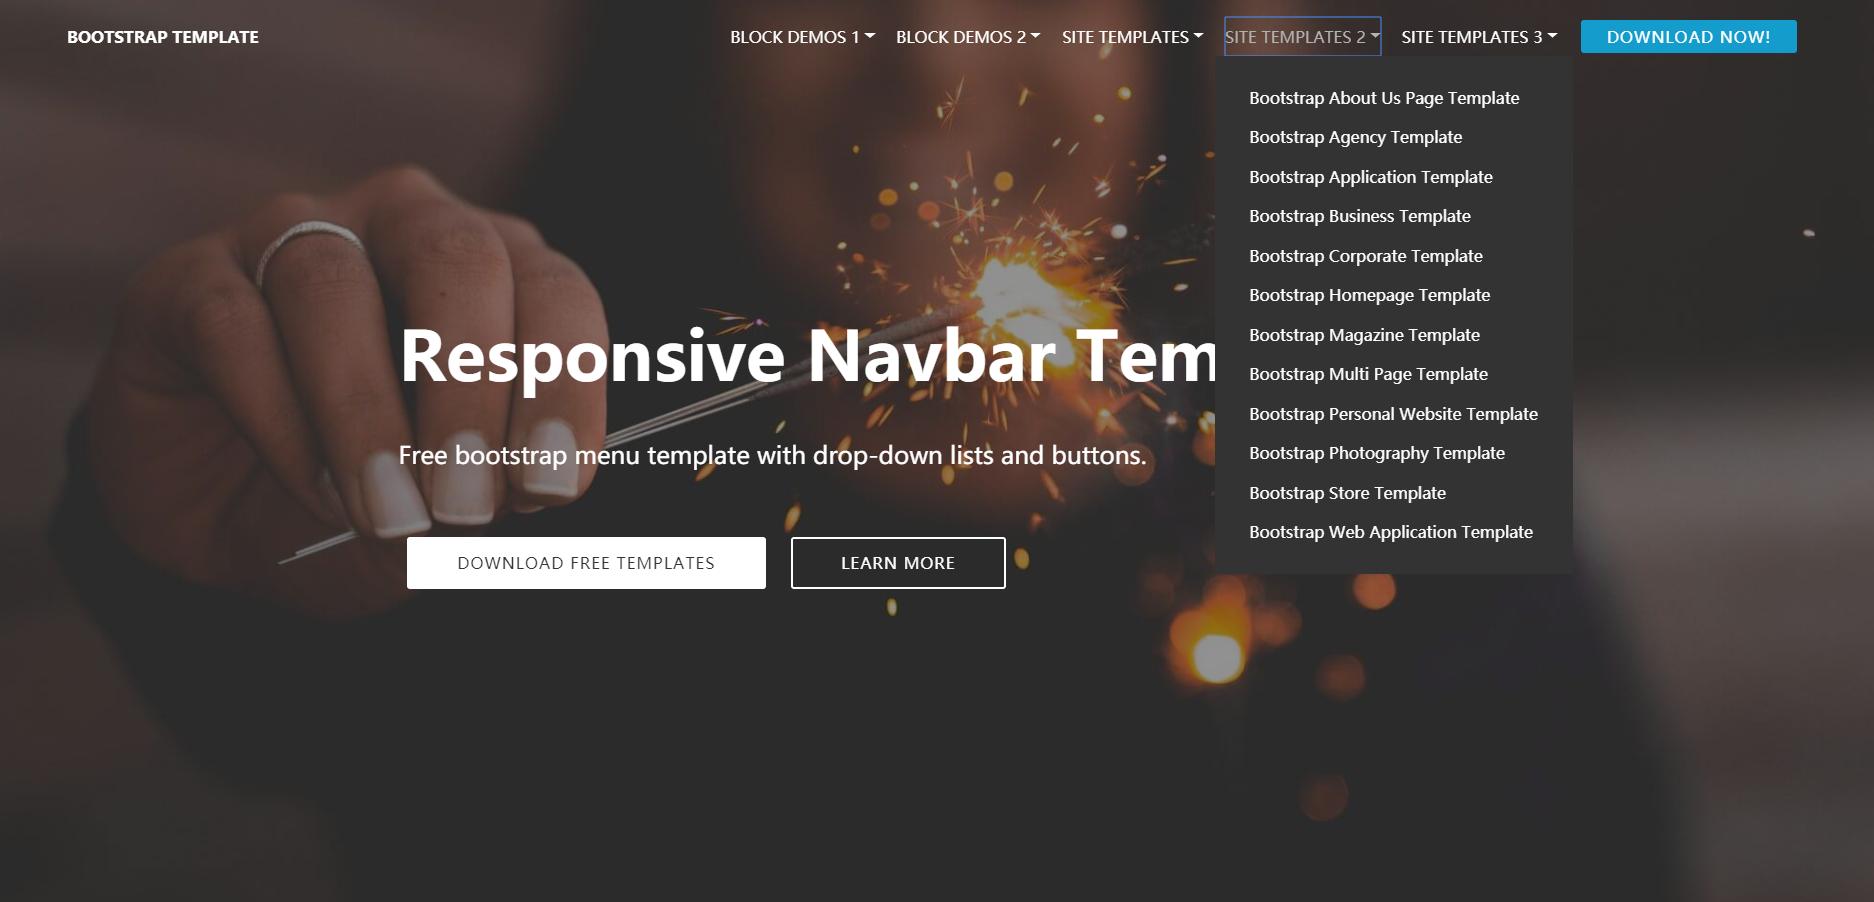 Responsive Navbar